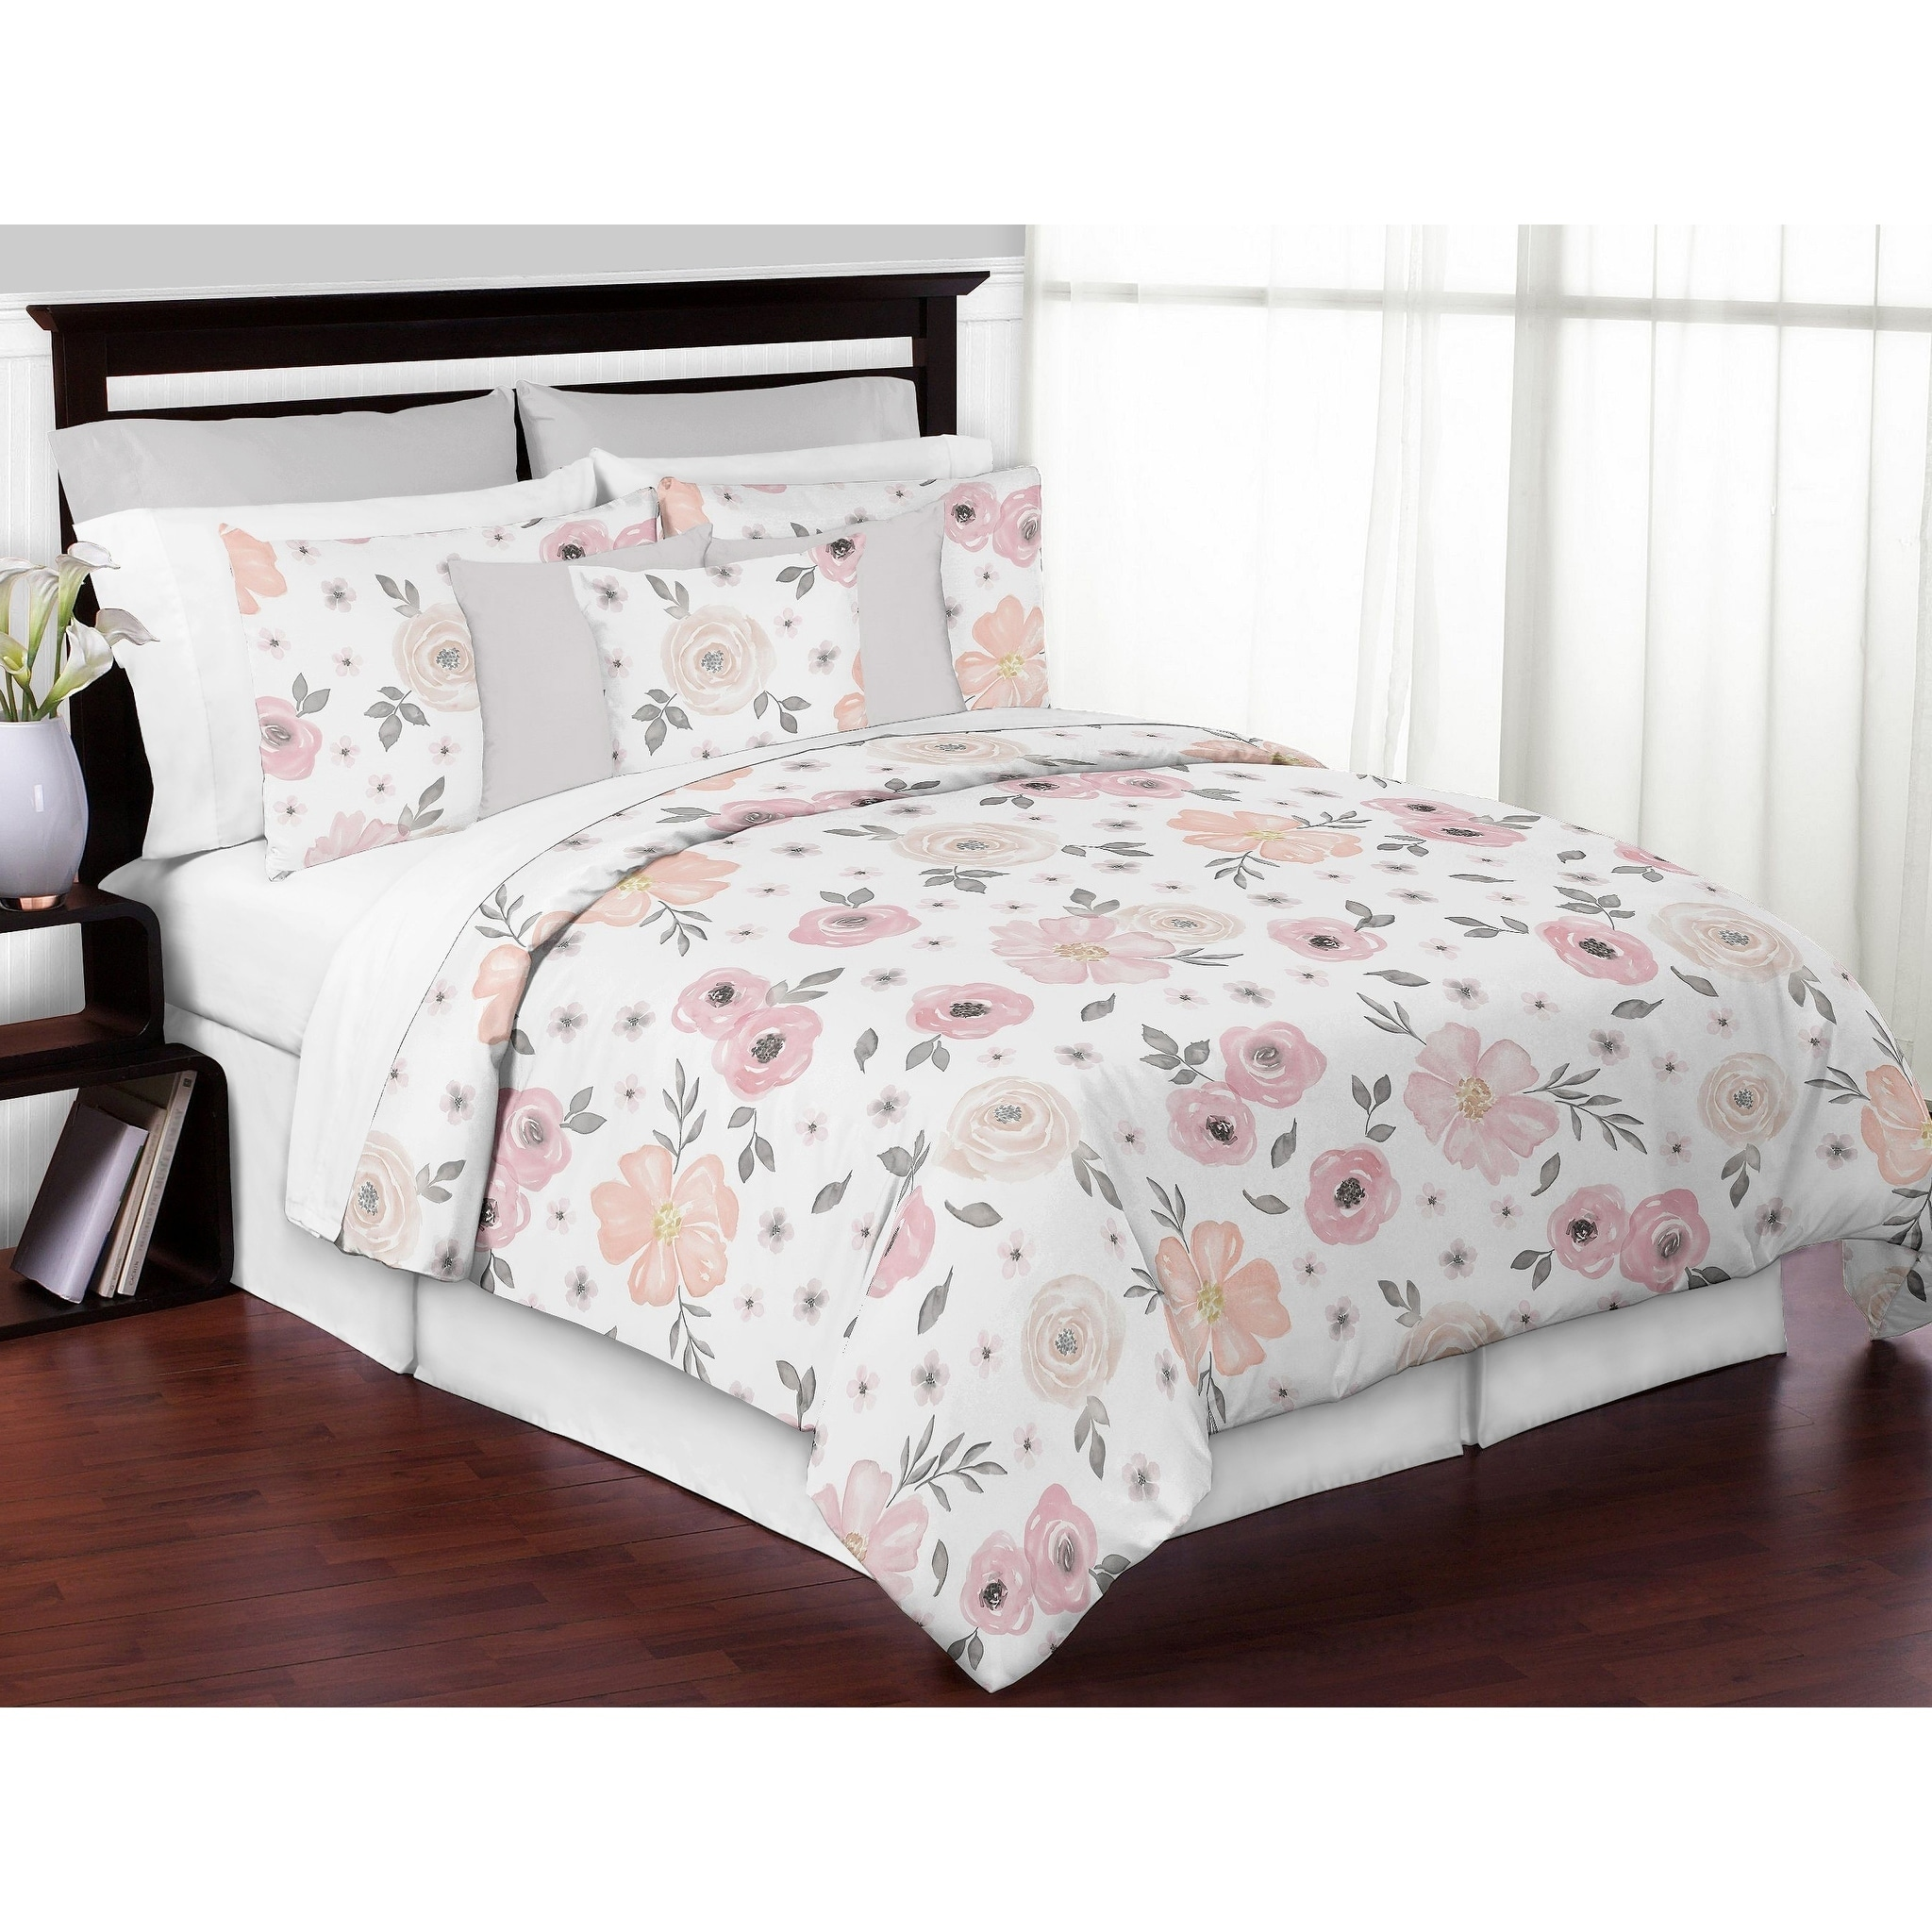 Shop Sweet Jojo Designs Blush Pink Grey And White Watercolor